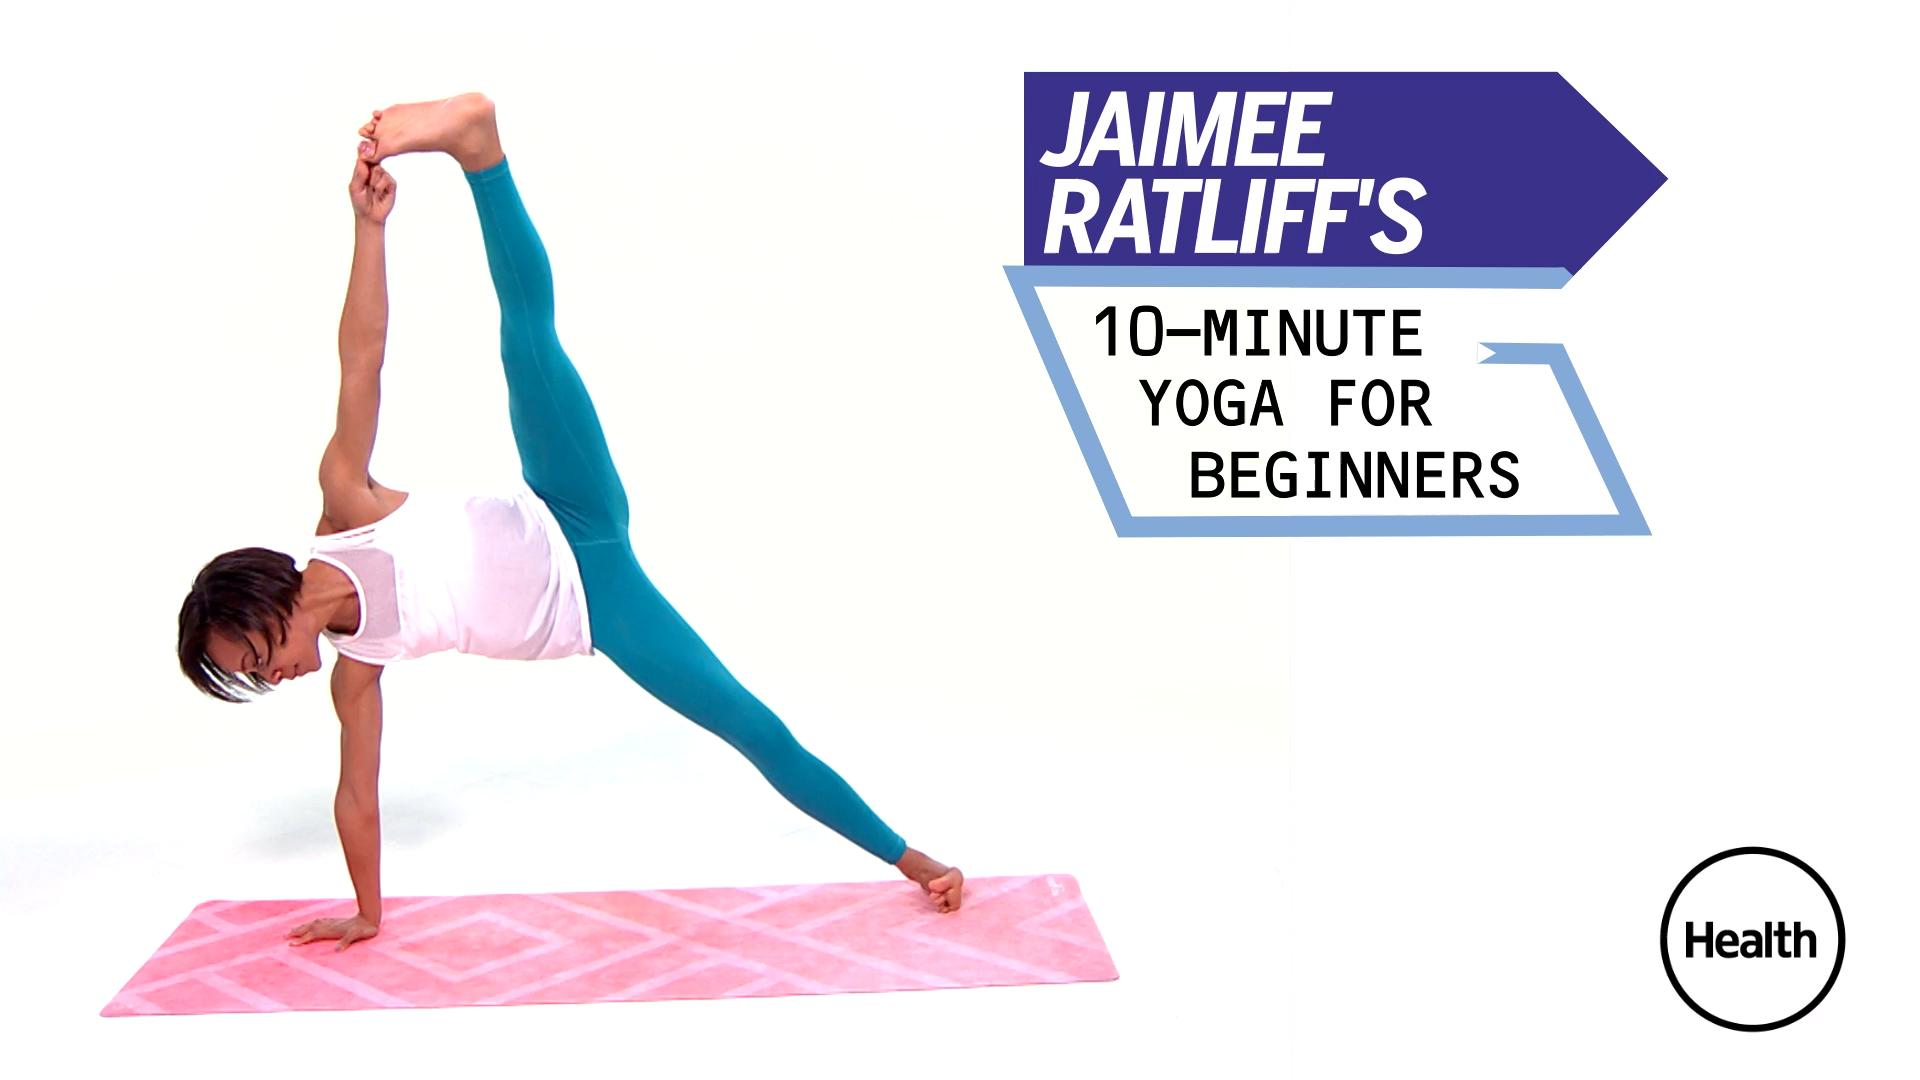 4dff6e859e4 The Perfect 10-Minute Yoga Intro for Newbies - Health